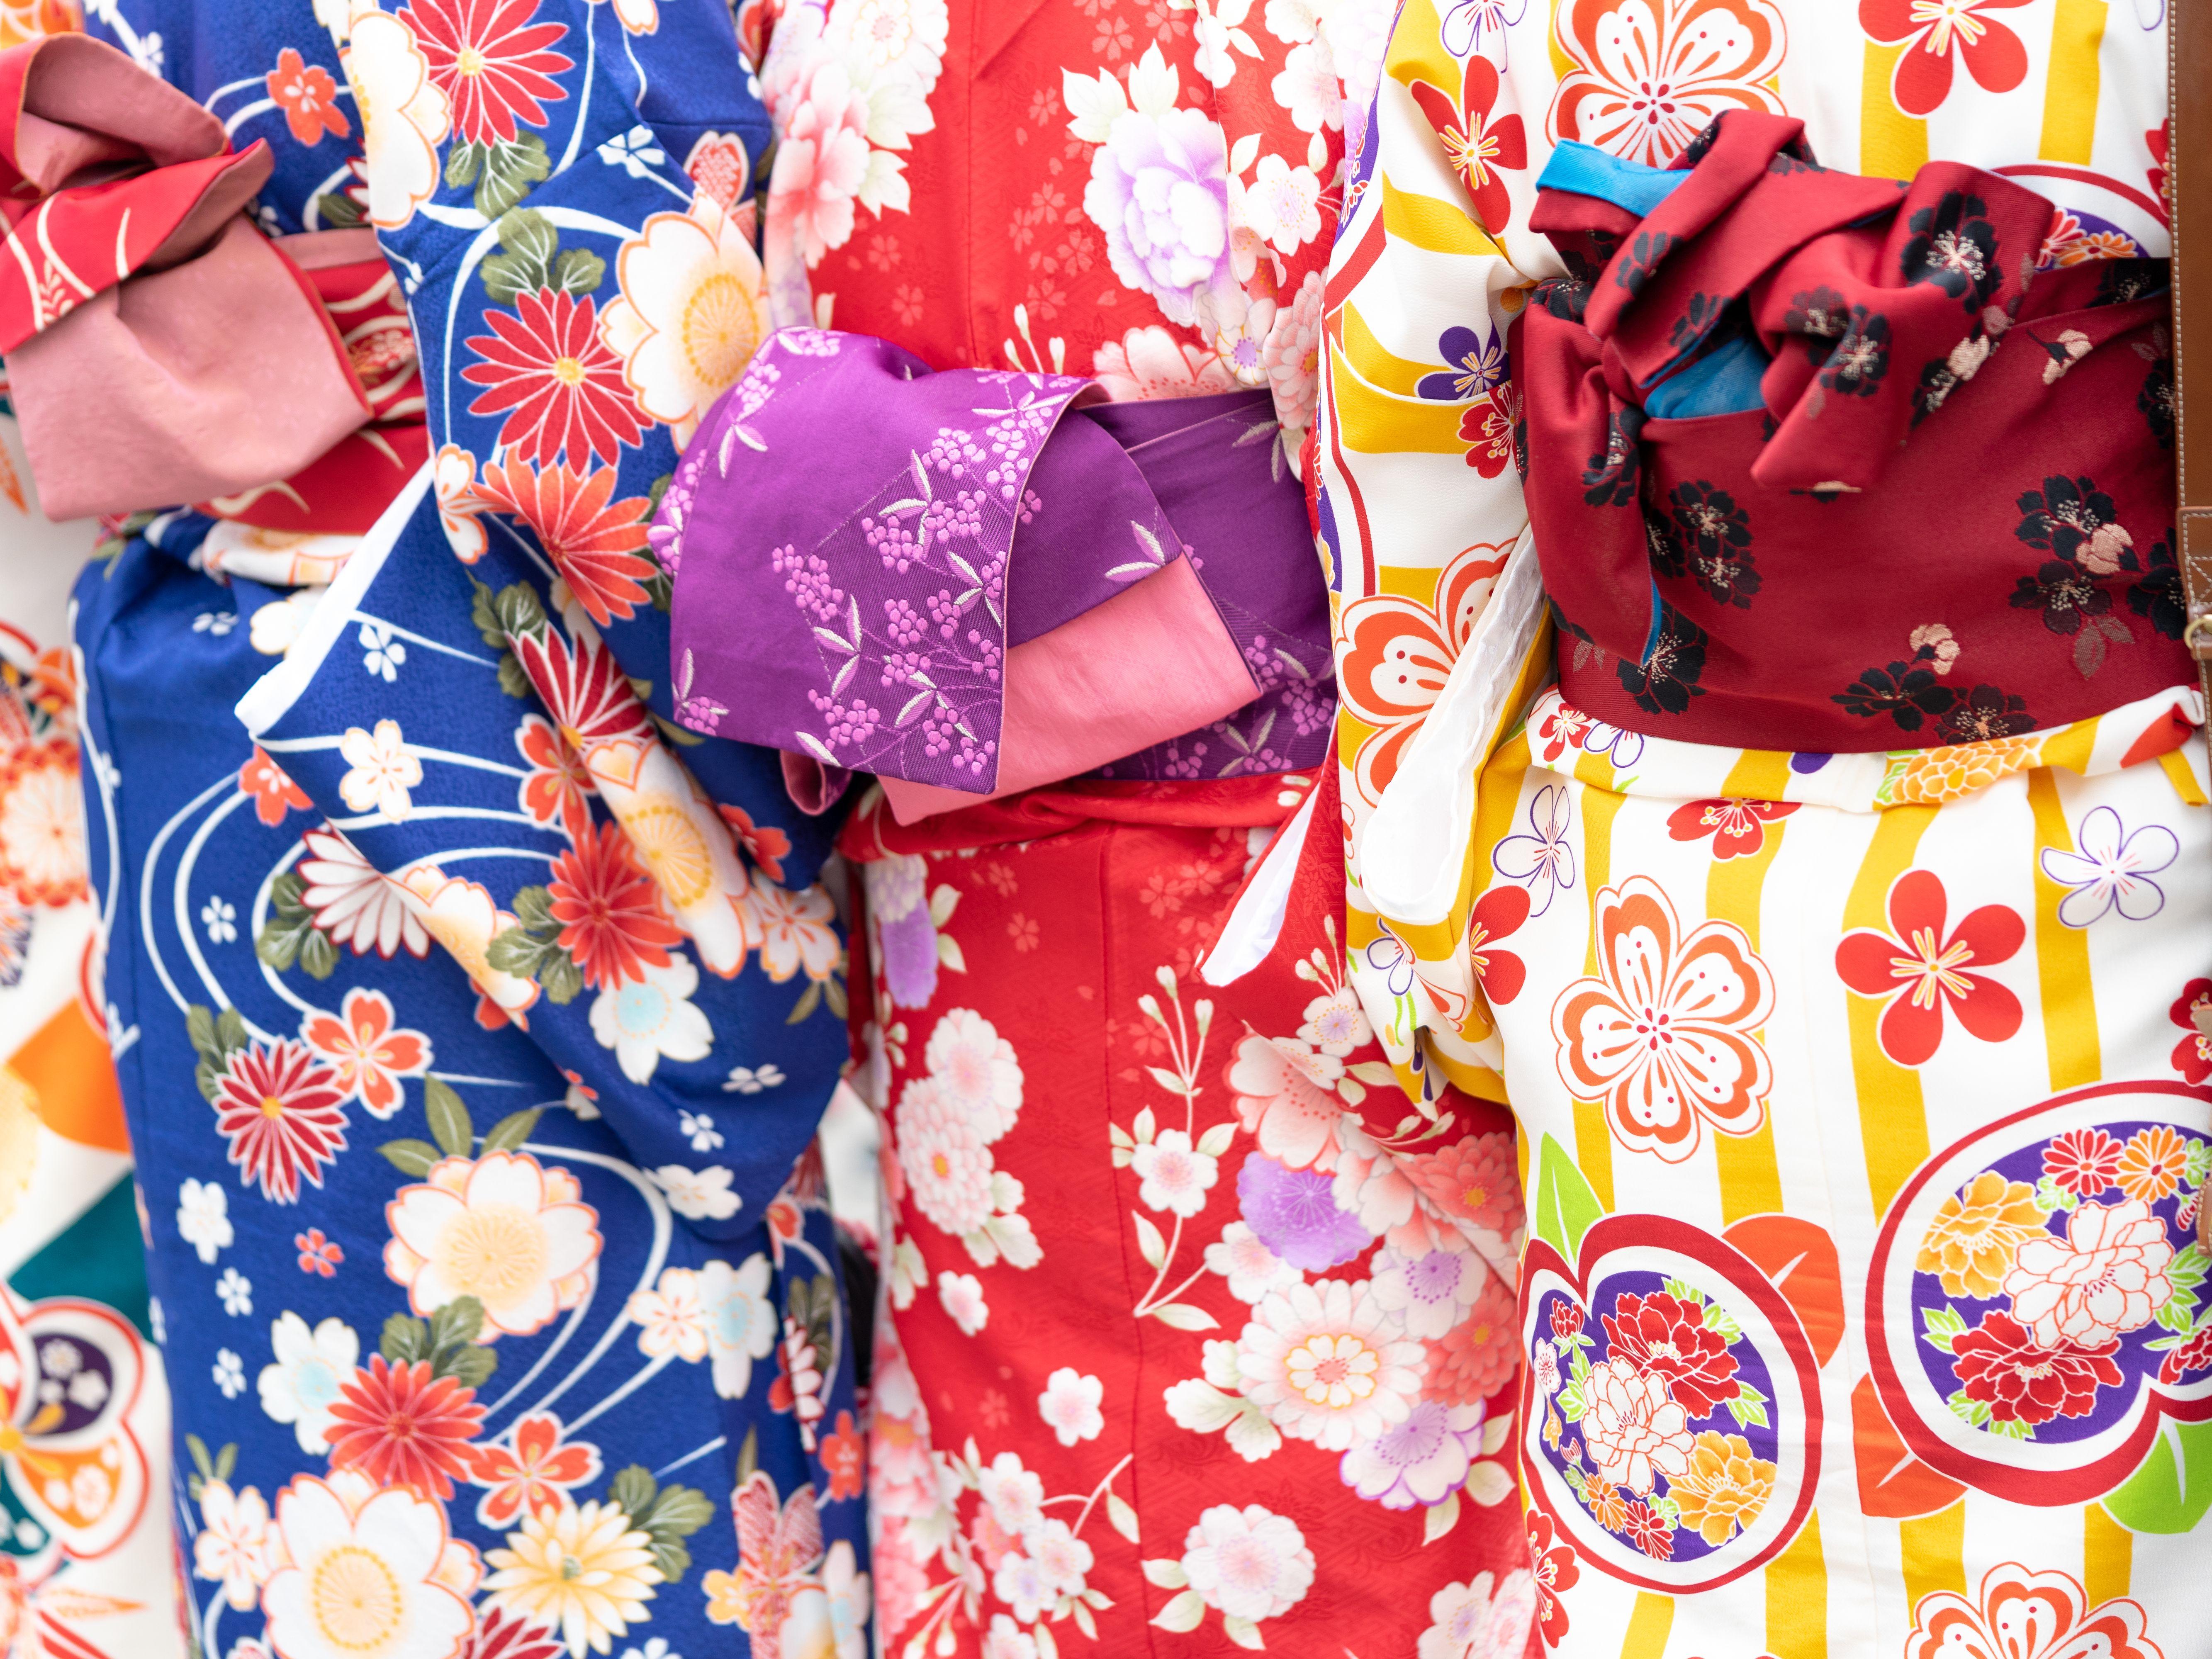 Kimonos, Fabric, Japanese, Colourful, Obi Belt